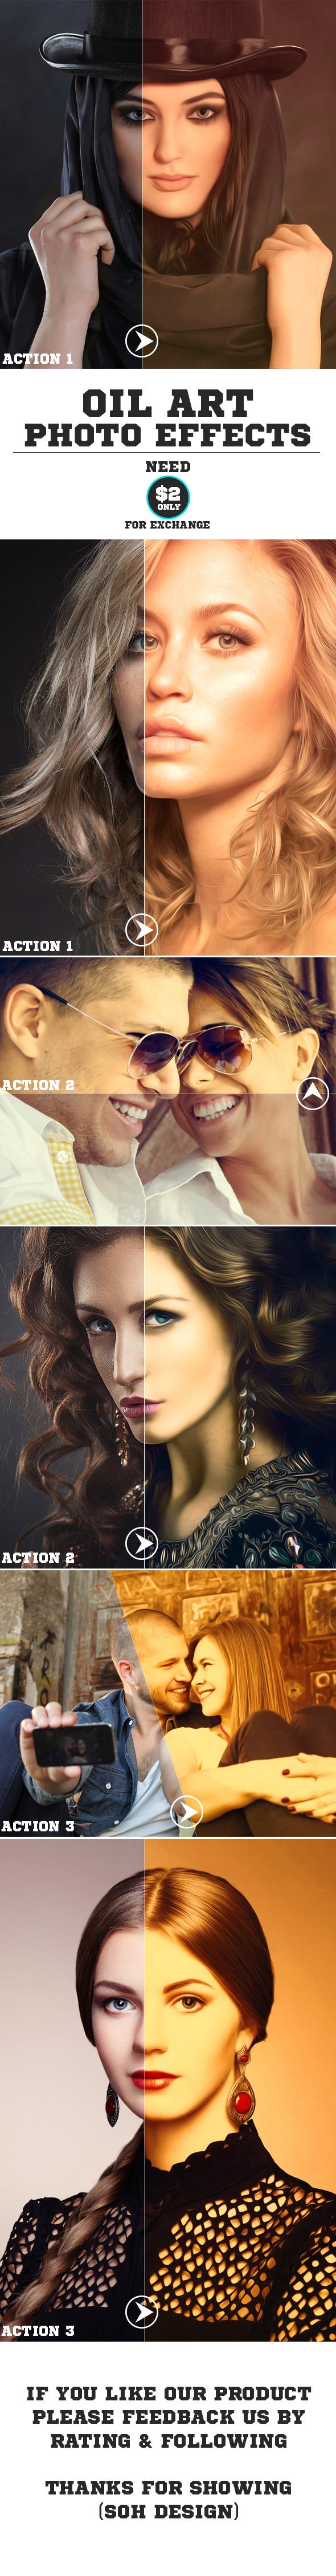 3-Oil Art Photo Effects